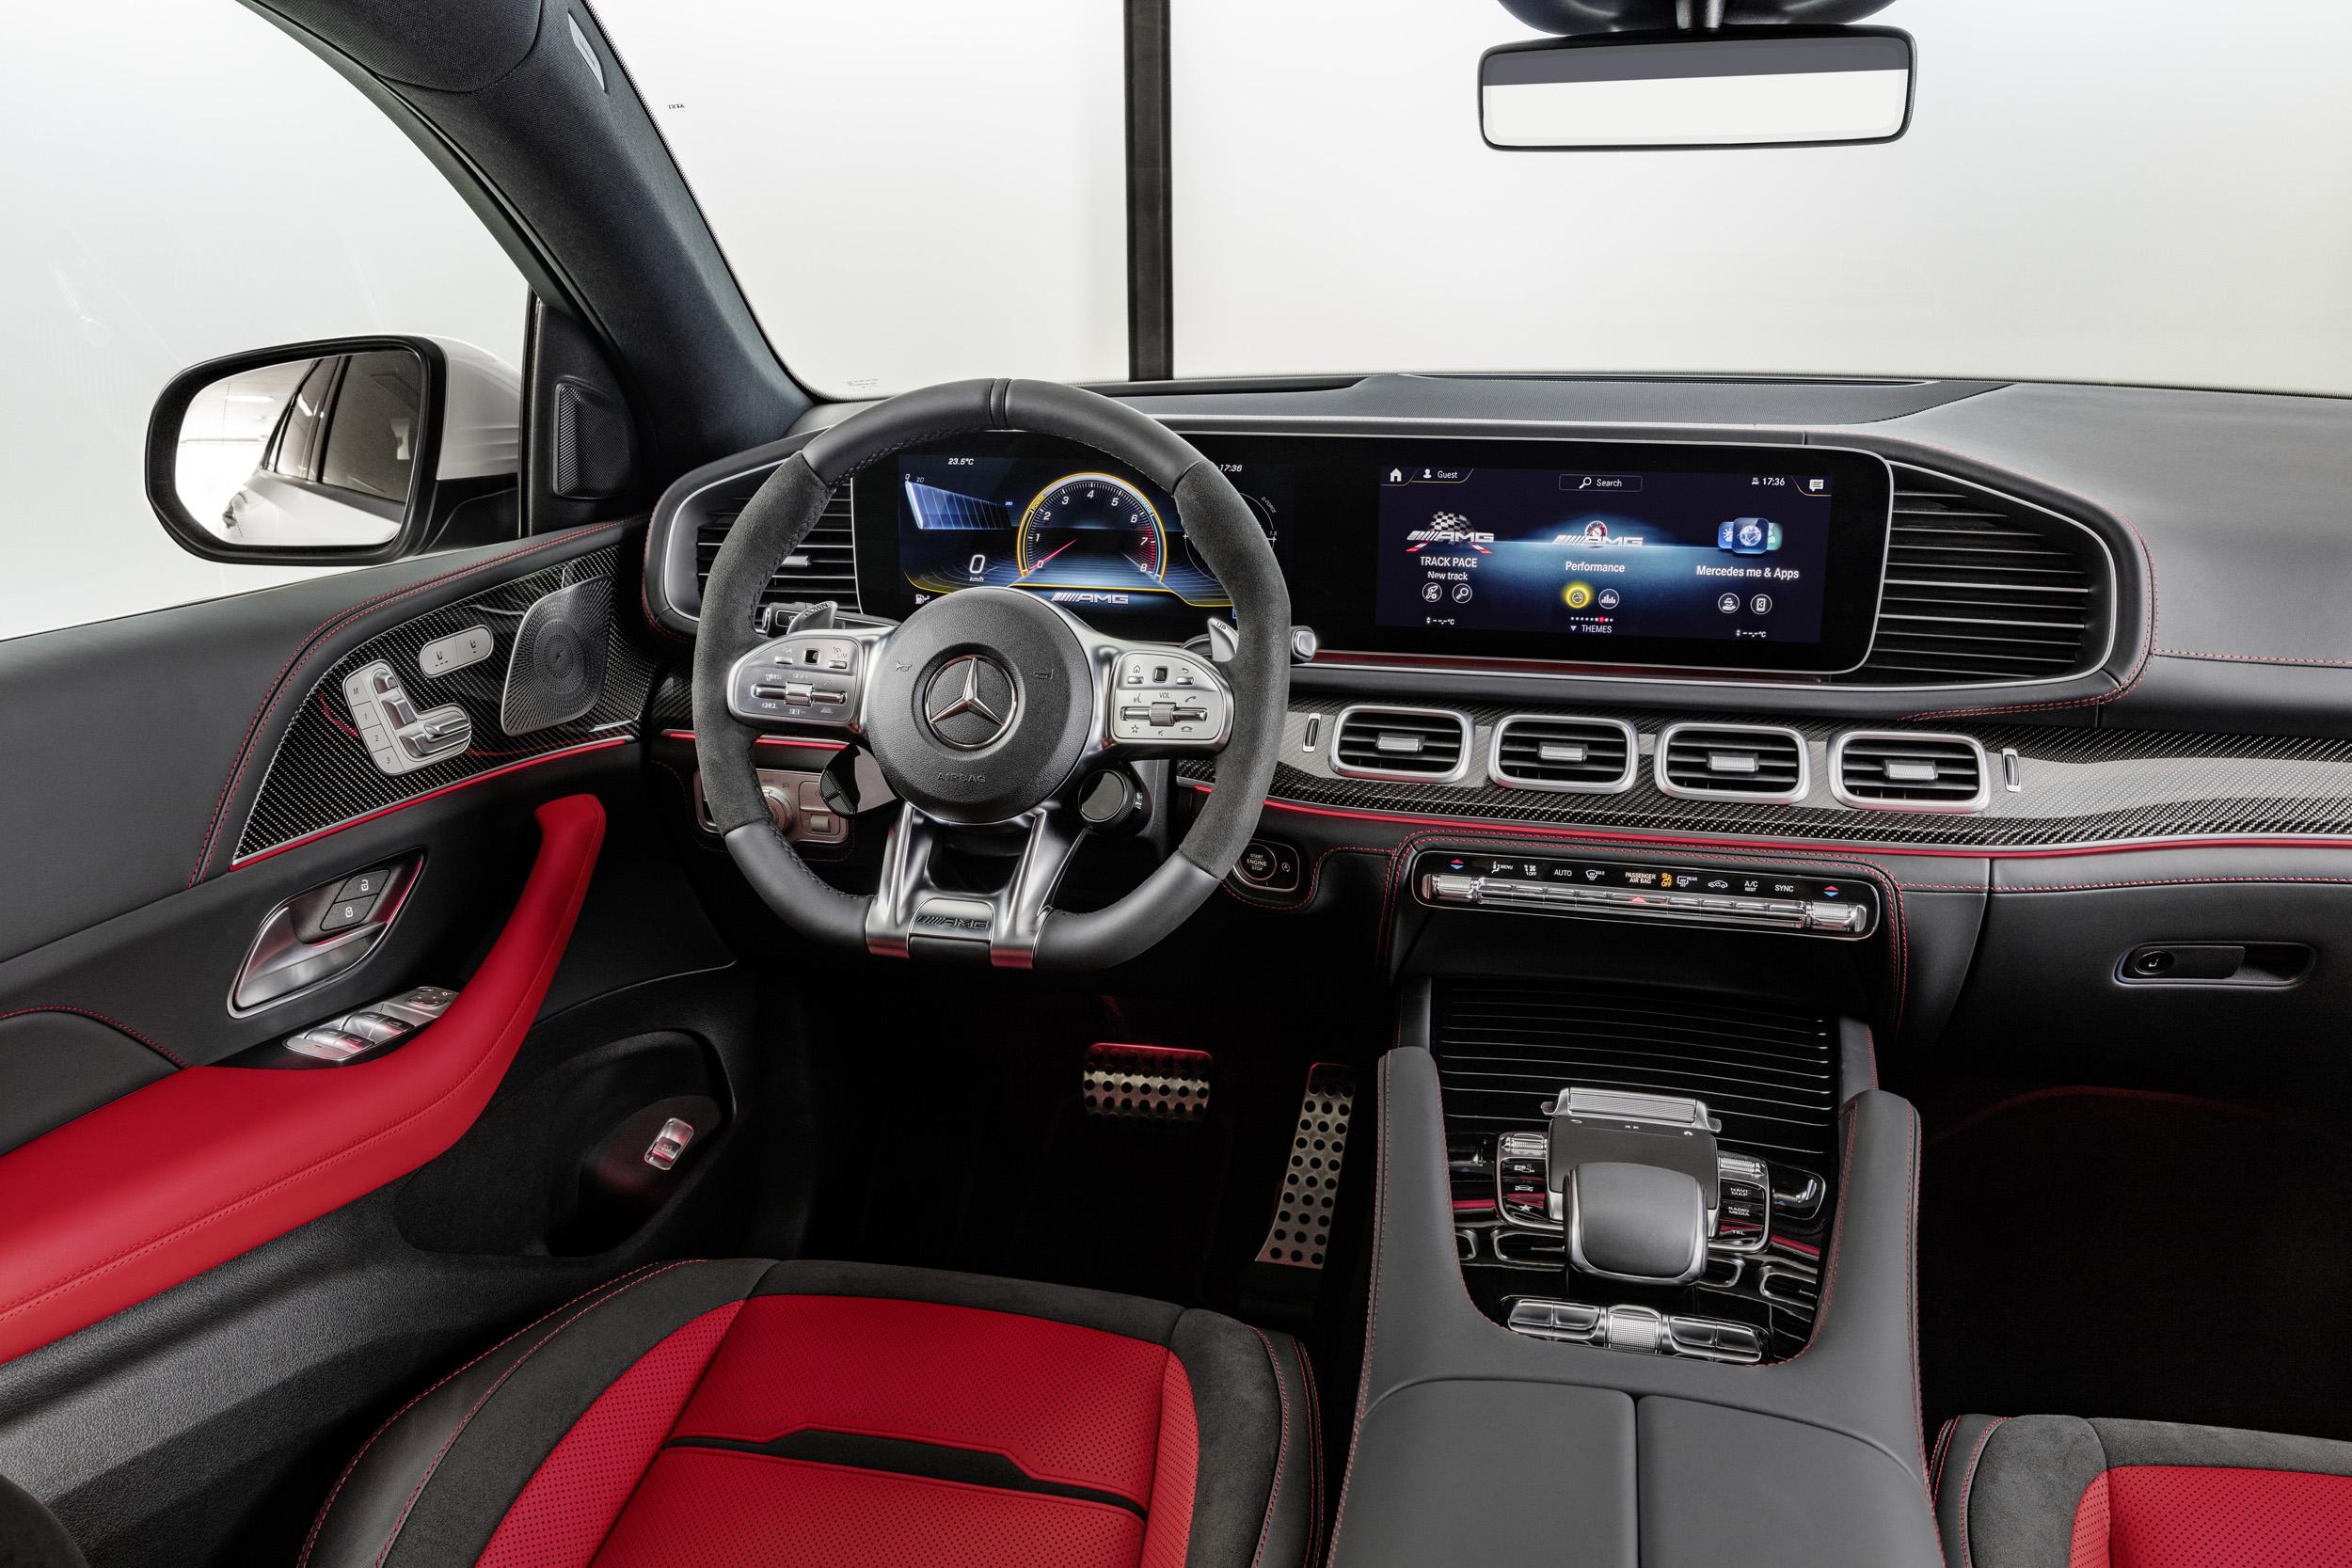 2021 Mercedes-AMG GLE 53 Coupe